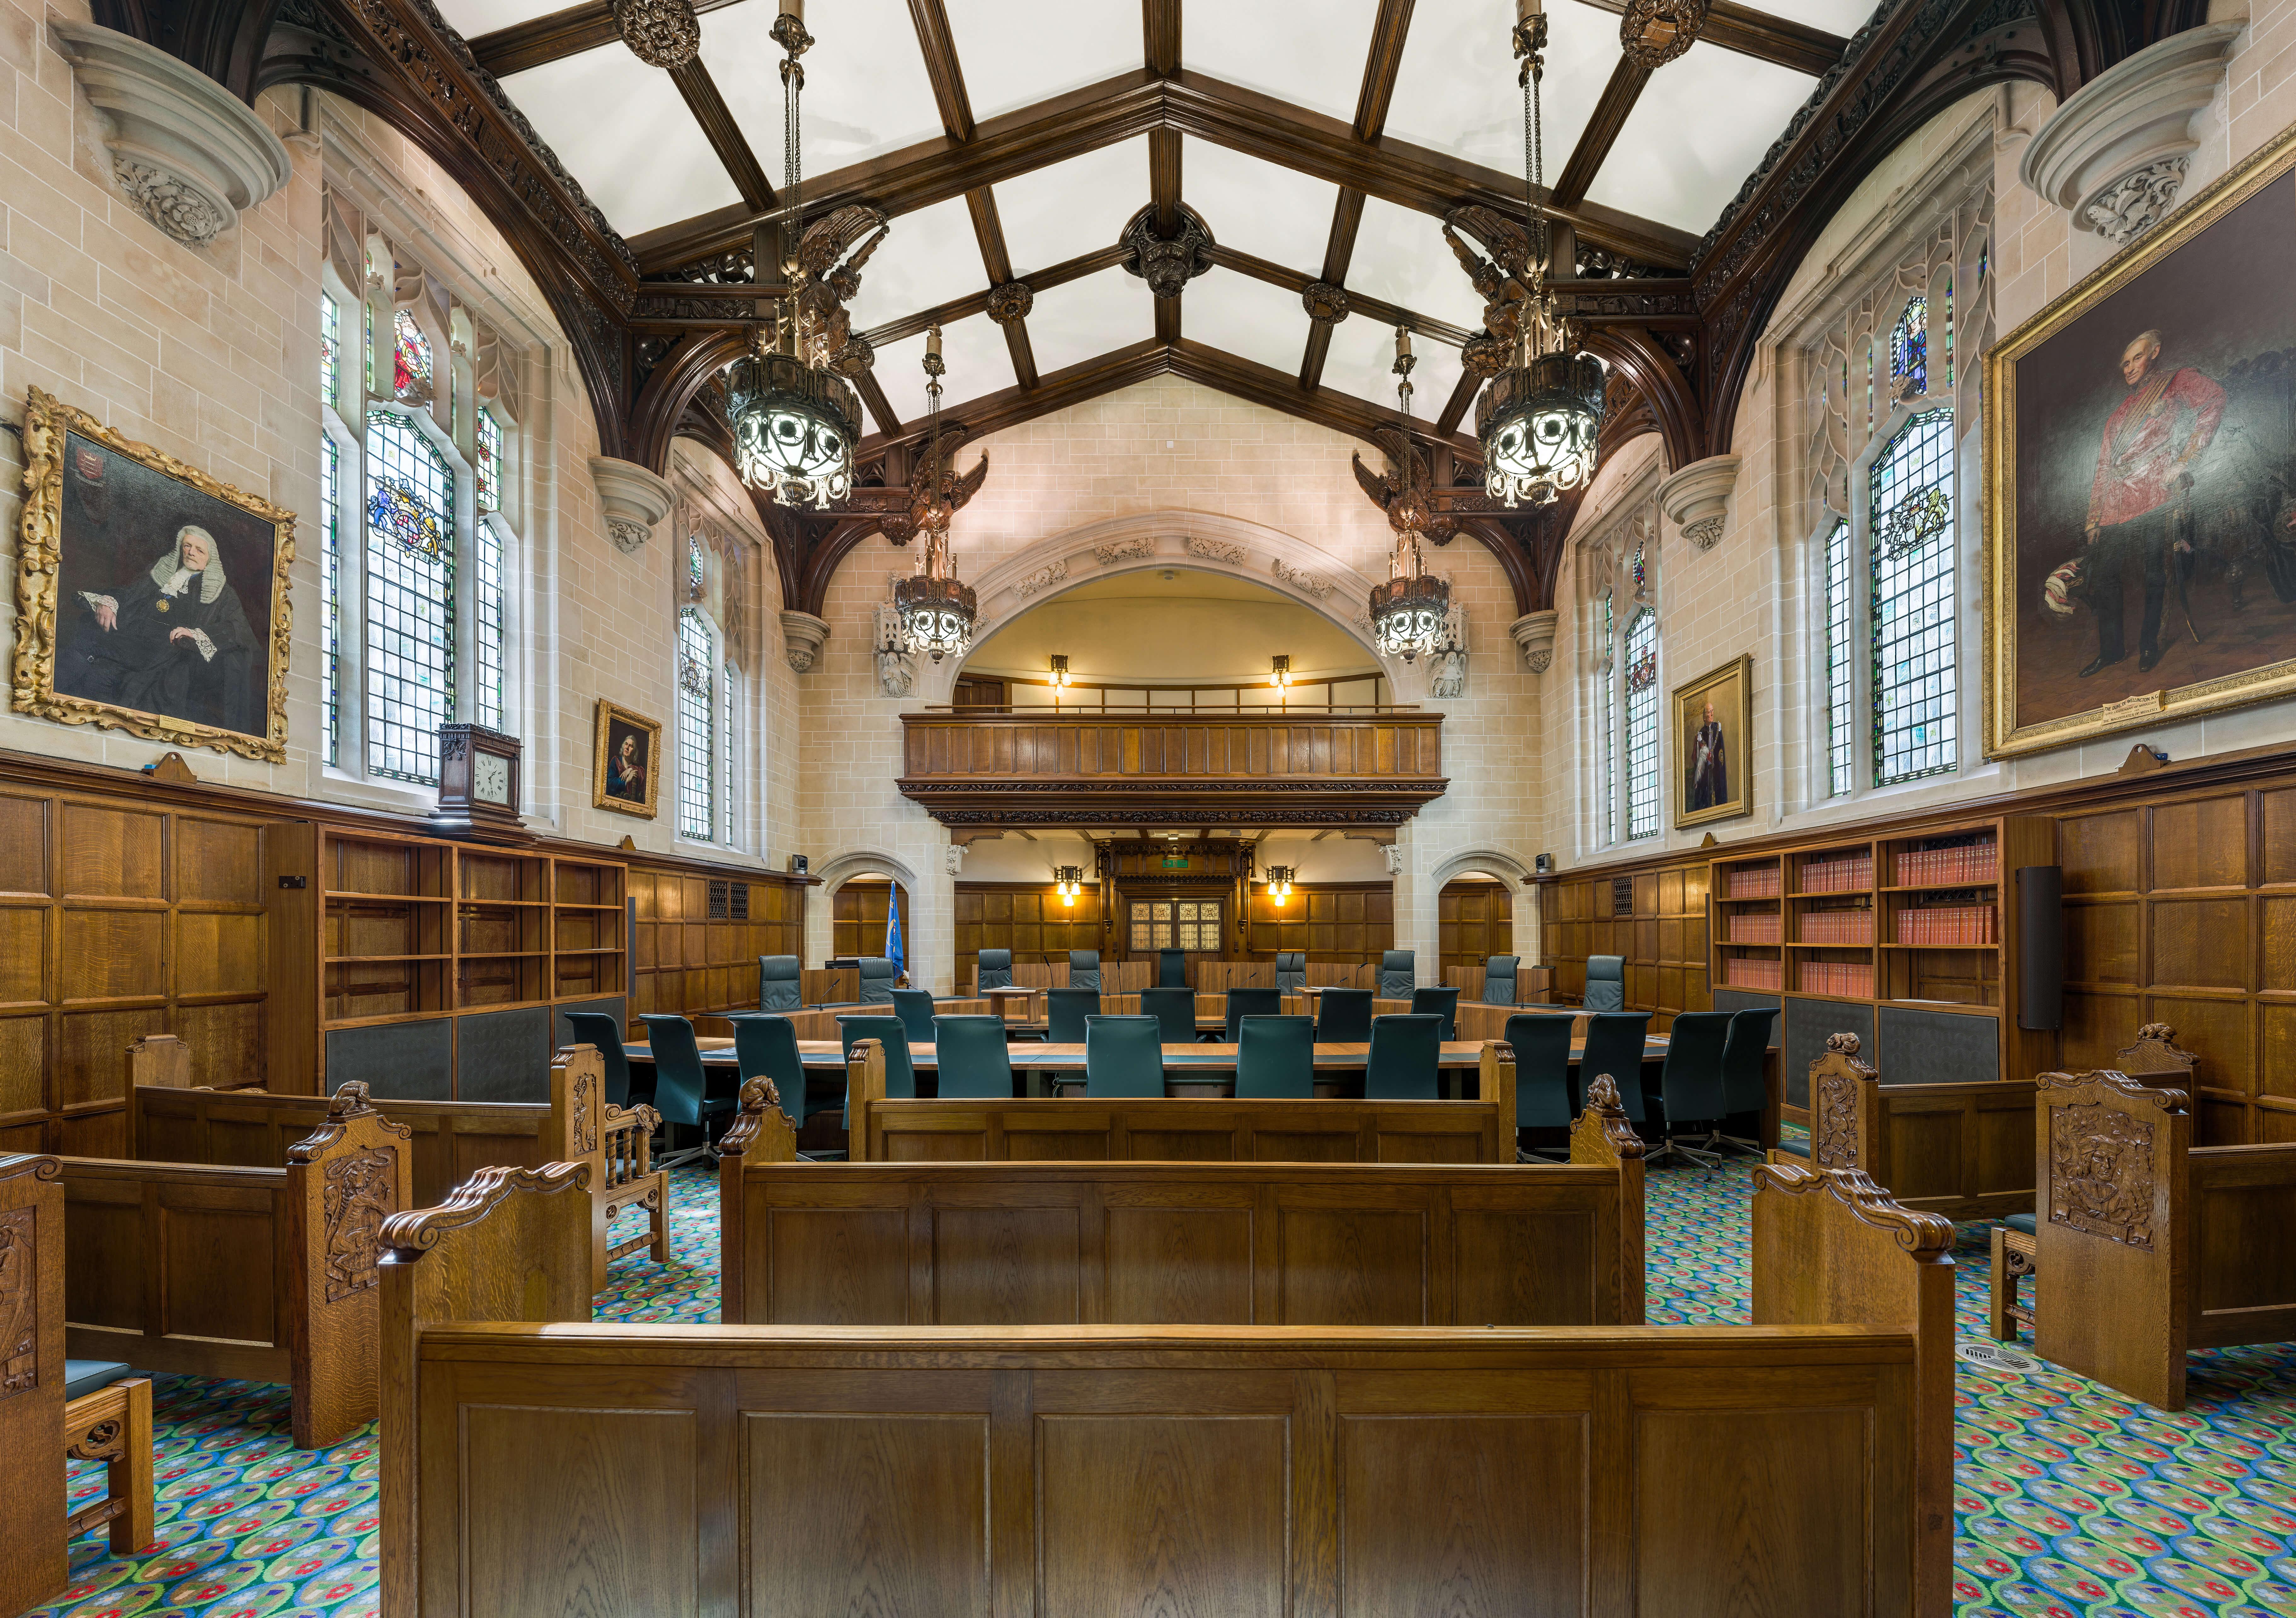 Work of Oxford Pro Bono Publico Receives Supreme Court Backing in Recent Belhaj Case